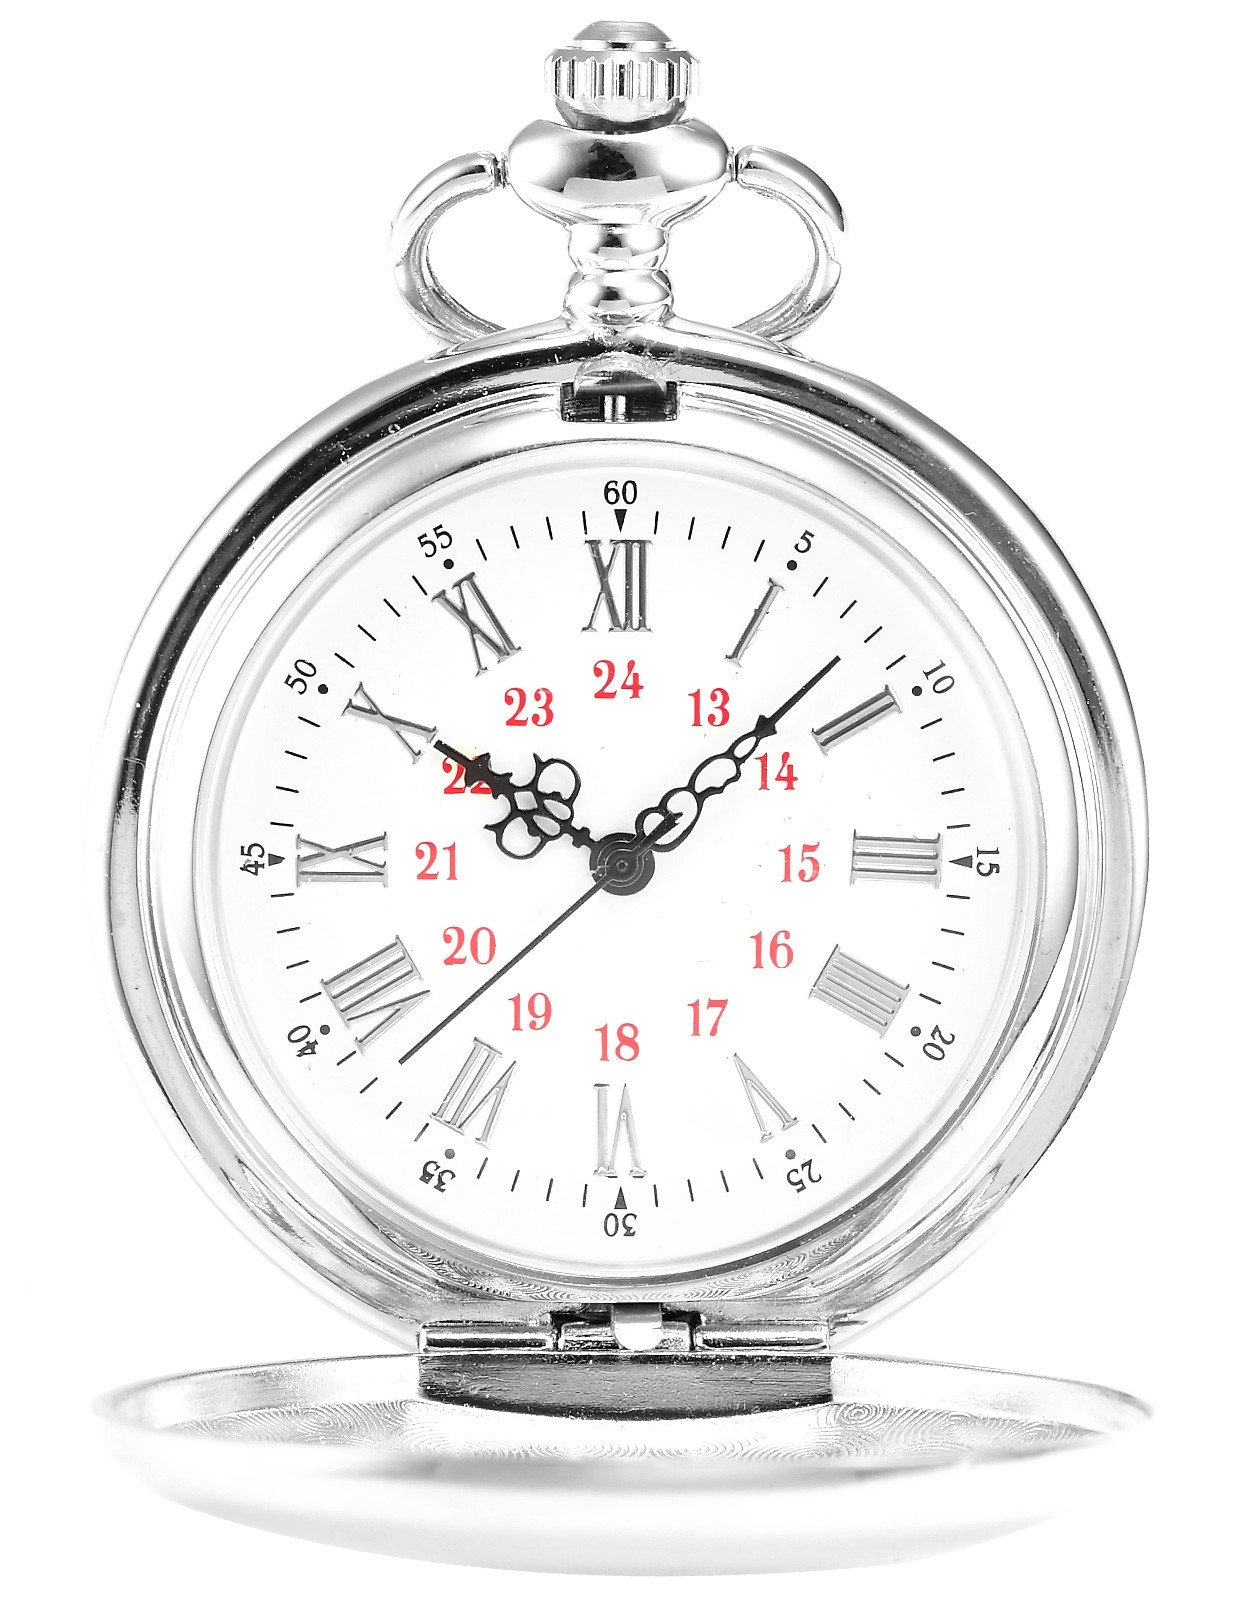 AMPM24 Vintage Silver Men's Women Ladies Quartz Pendent Pocket Watch Clock Chain Gift WPK027